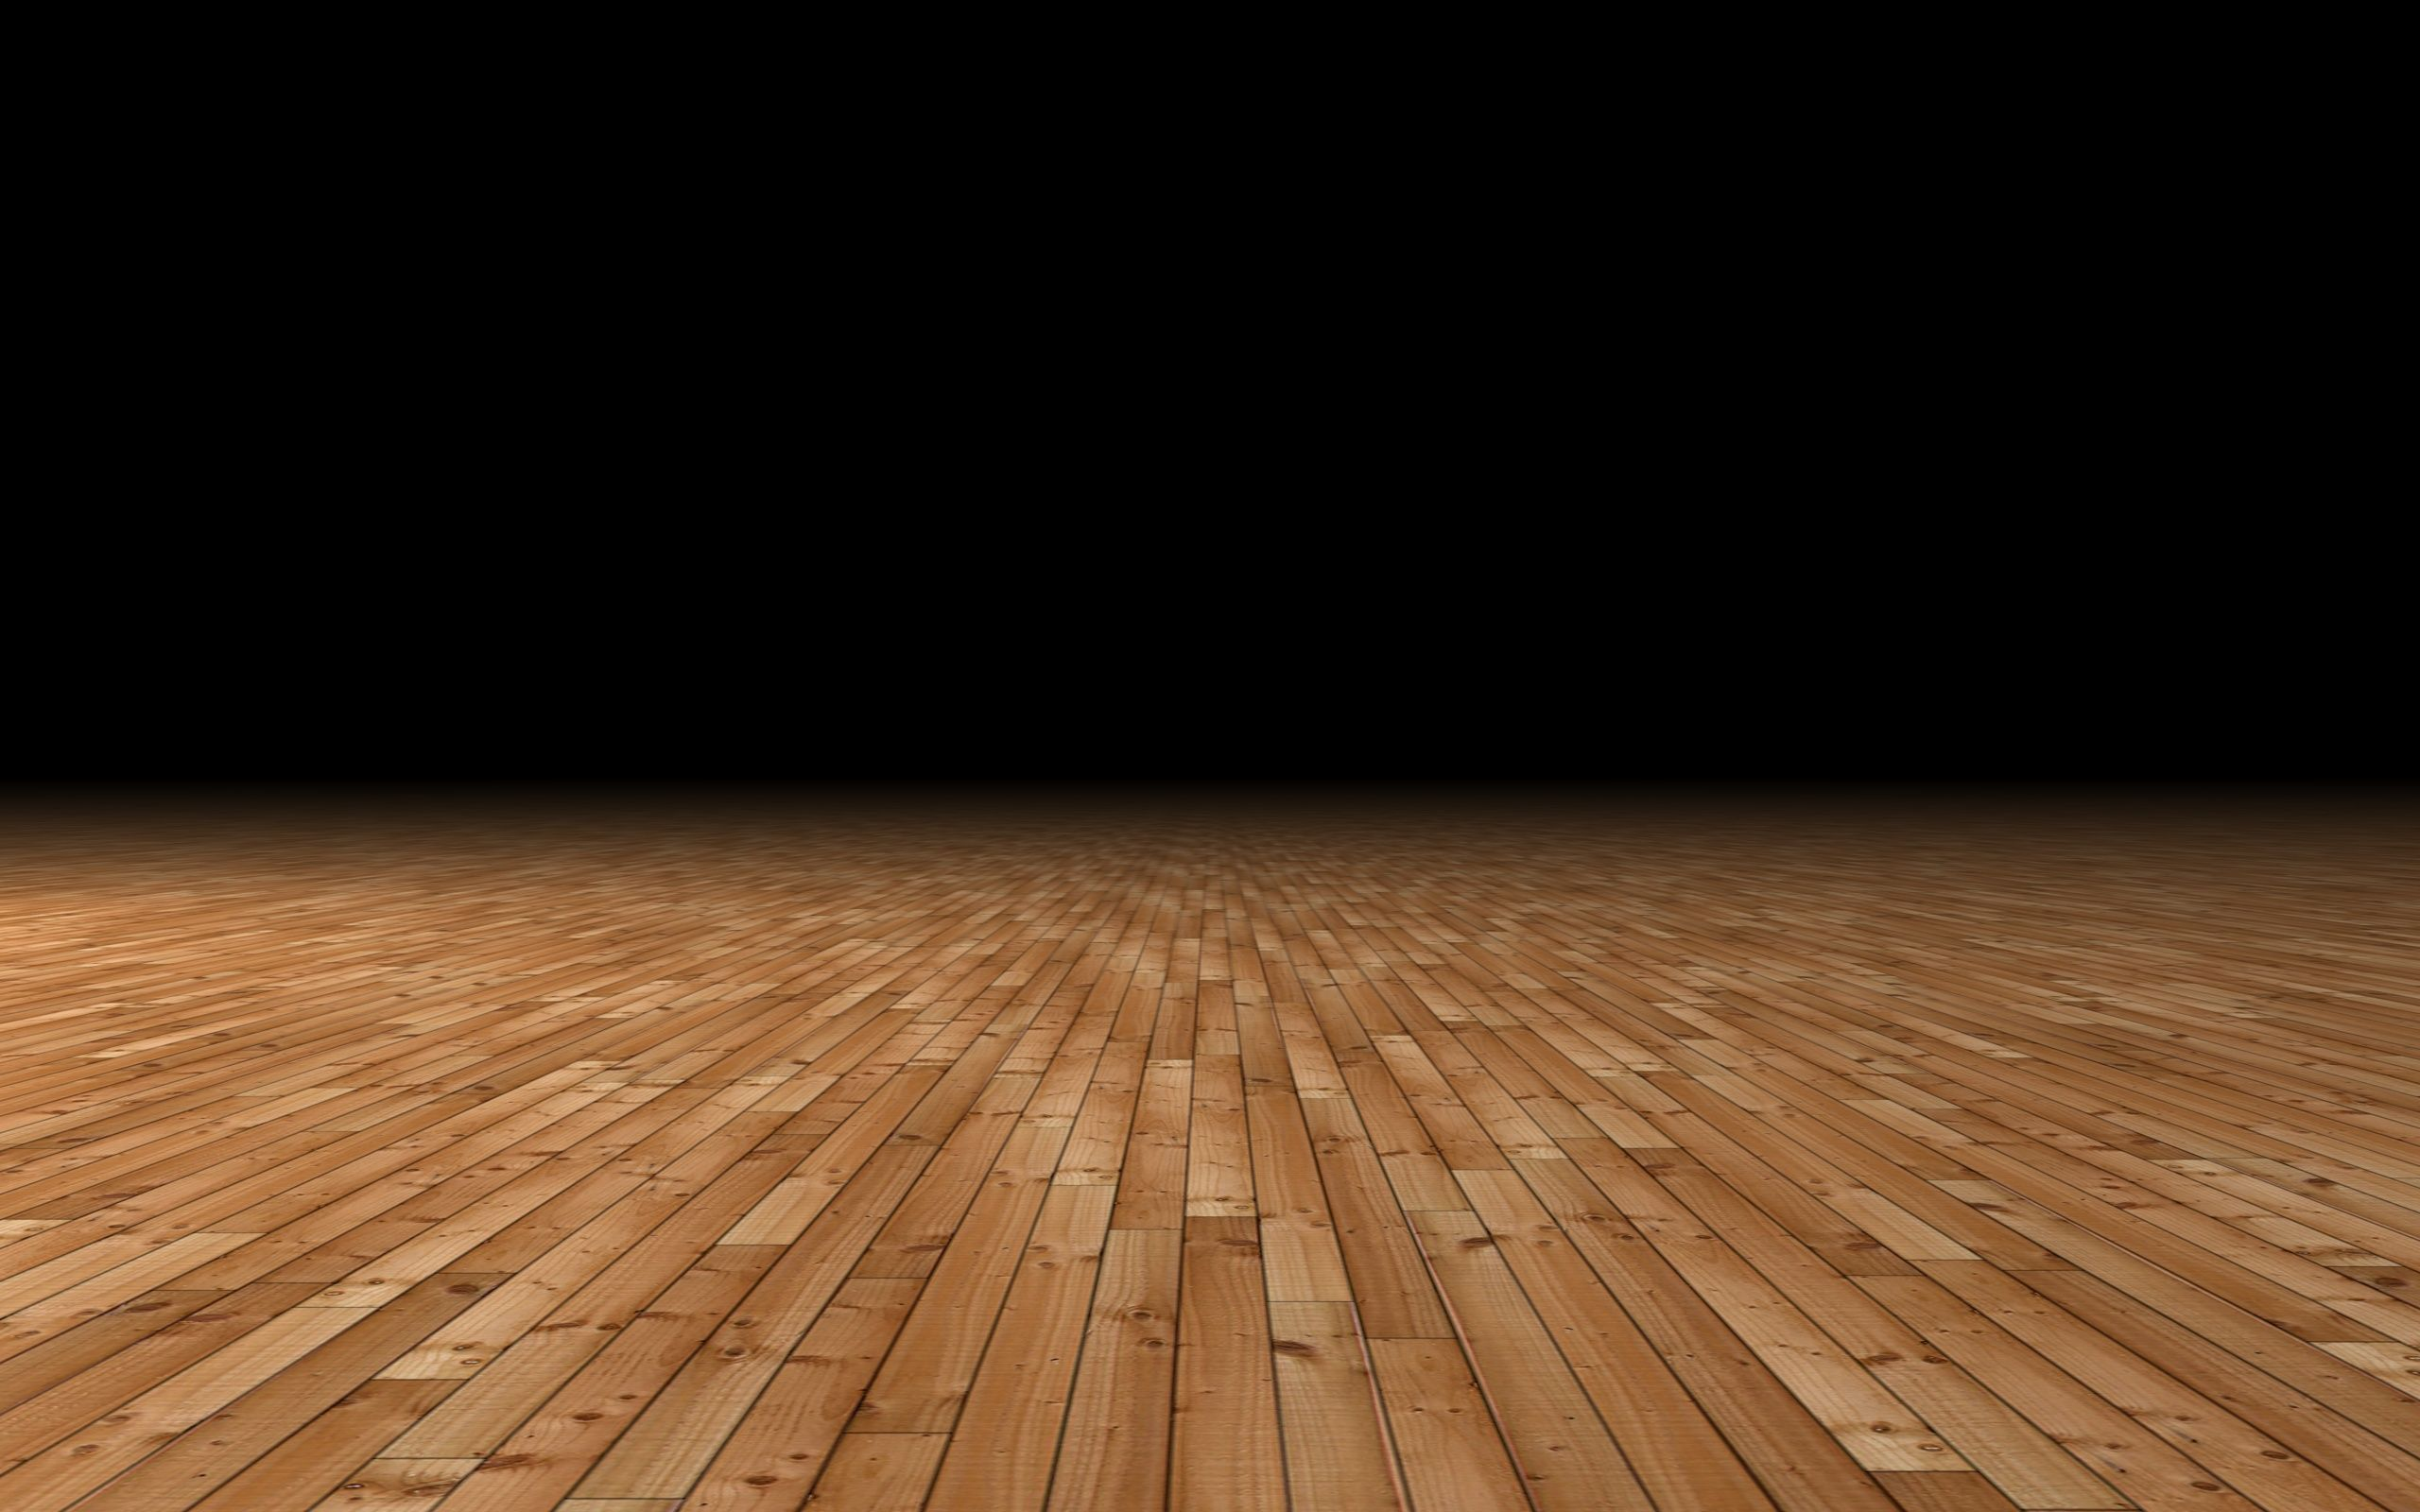 Basketball Court 675975 Jpg 2560 1600 Floor Wallpaper Wood Floors Dark Wood Floors